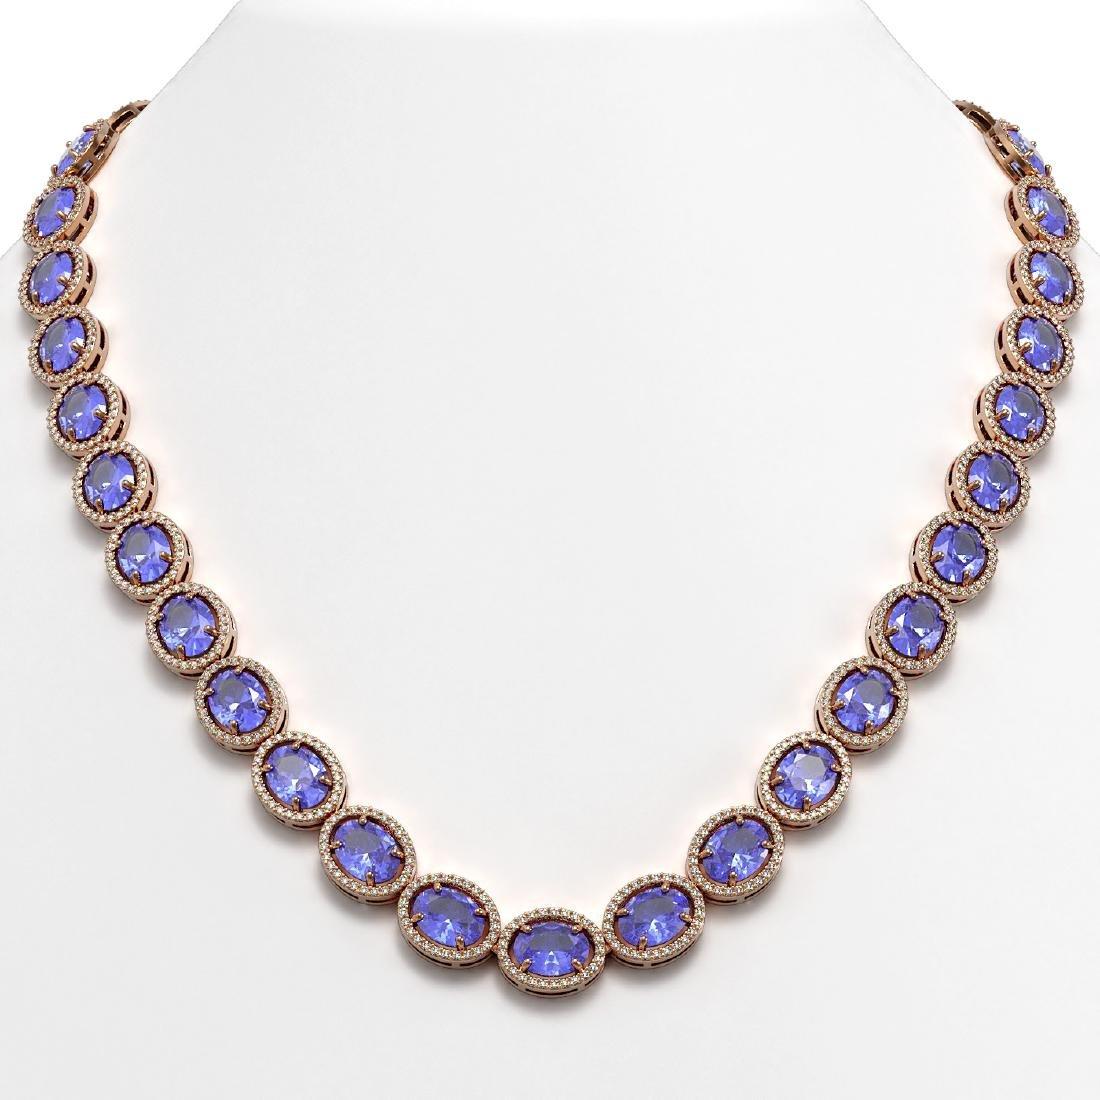 62.99 CTW Tanzanite & Diamond Halo Necklace 10K Rose